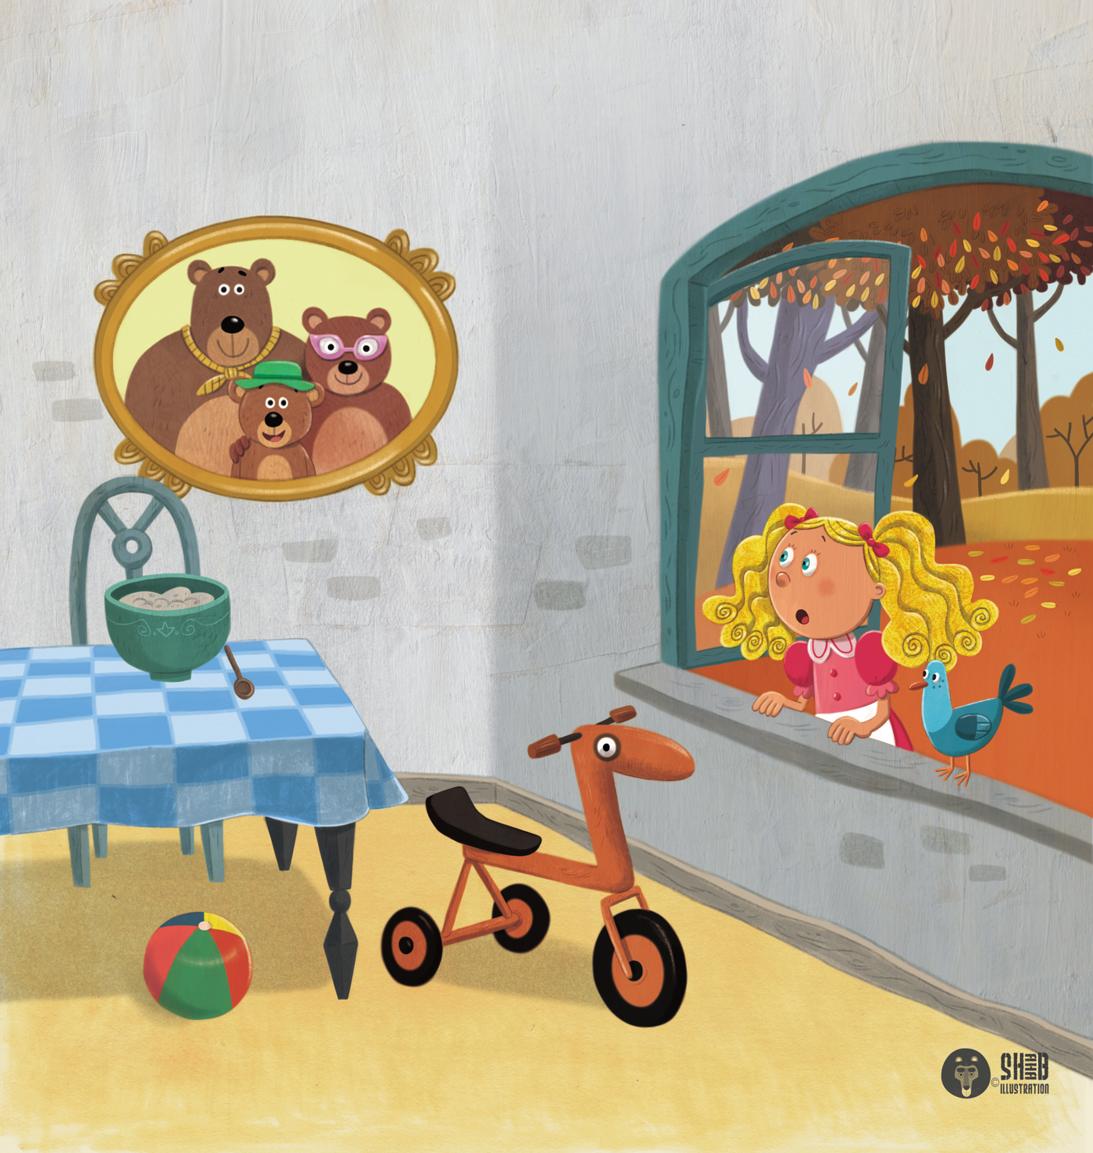 goldilocks and the three bears ebook